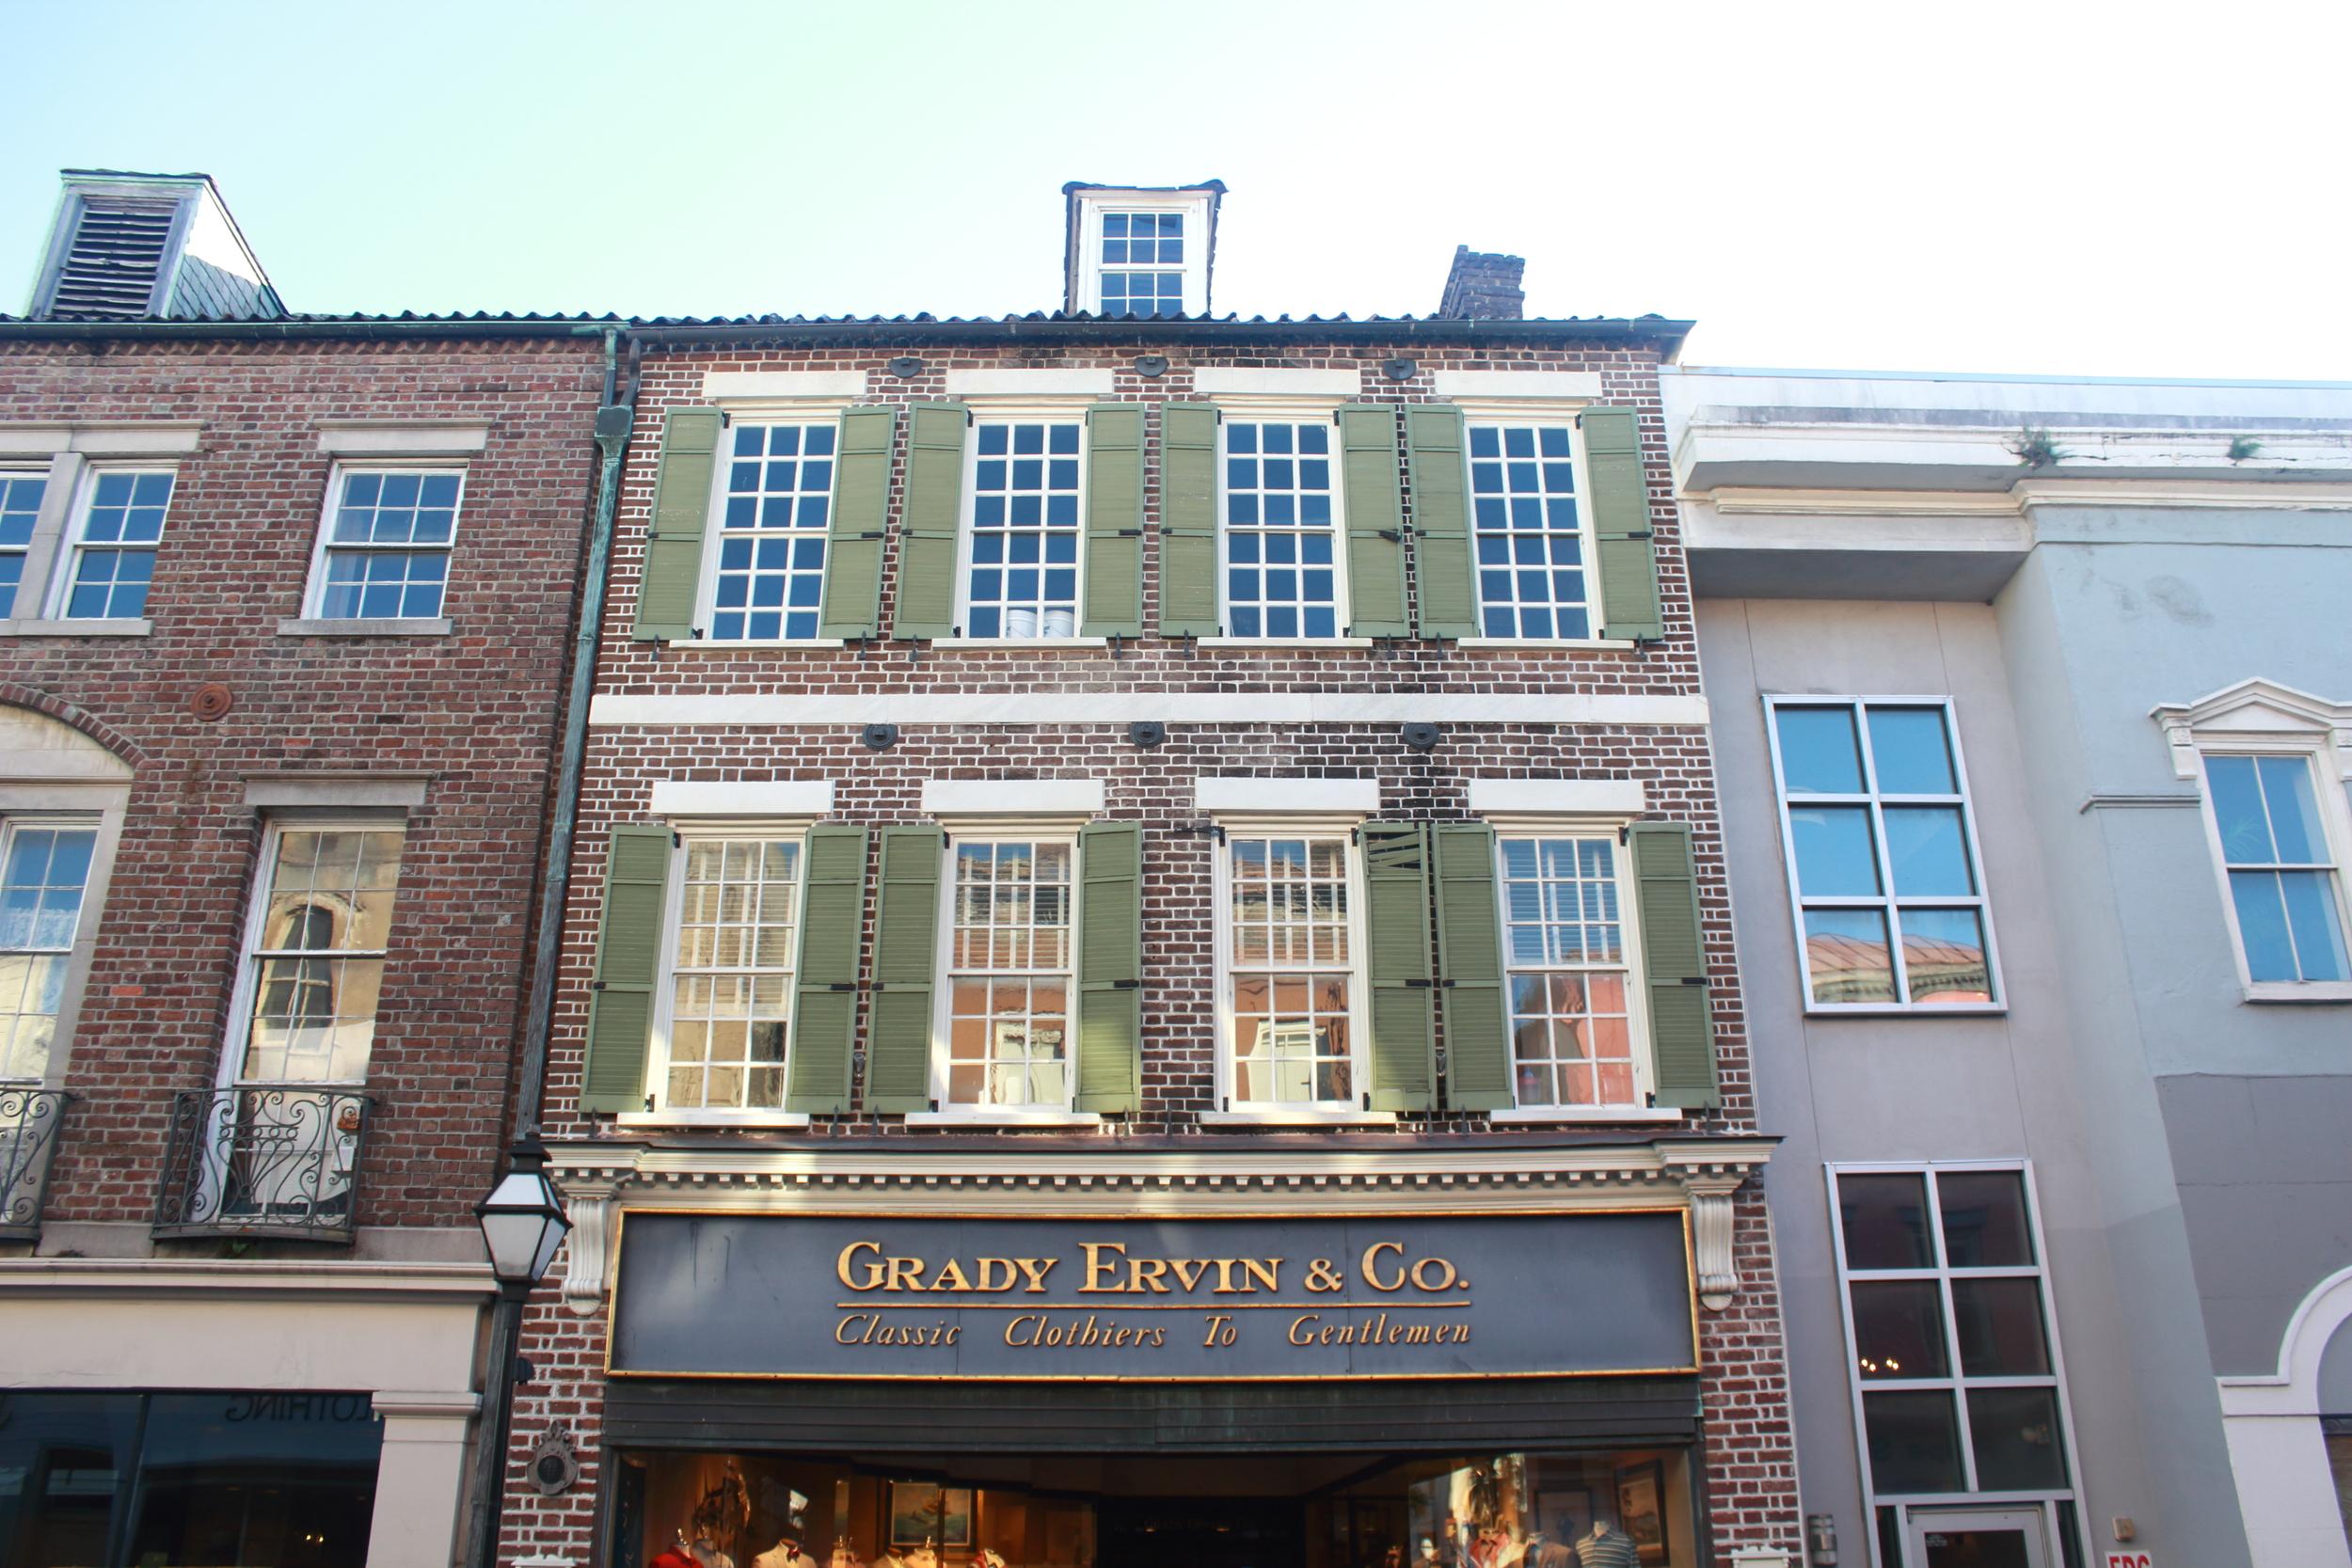 Top 5 things to do in Charleston, South Carolina